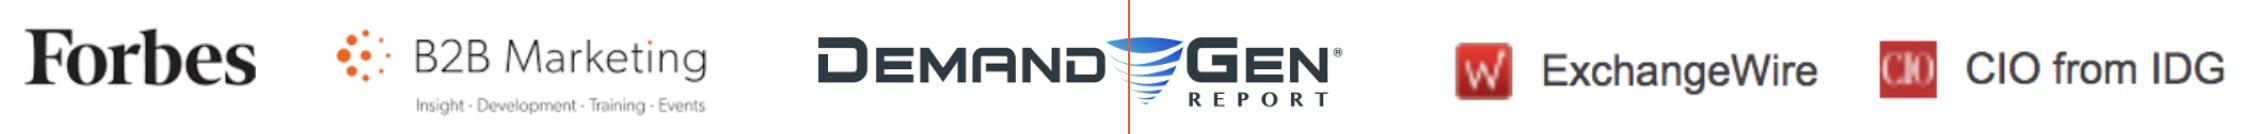 Logos for Forbes, B2B Marketing, Demand Gen, ExchangeWire, CIO from IDG